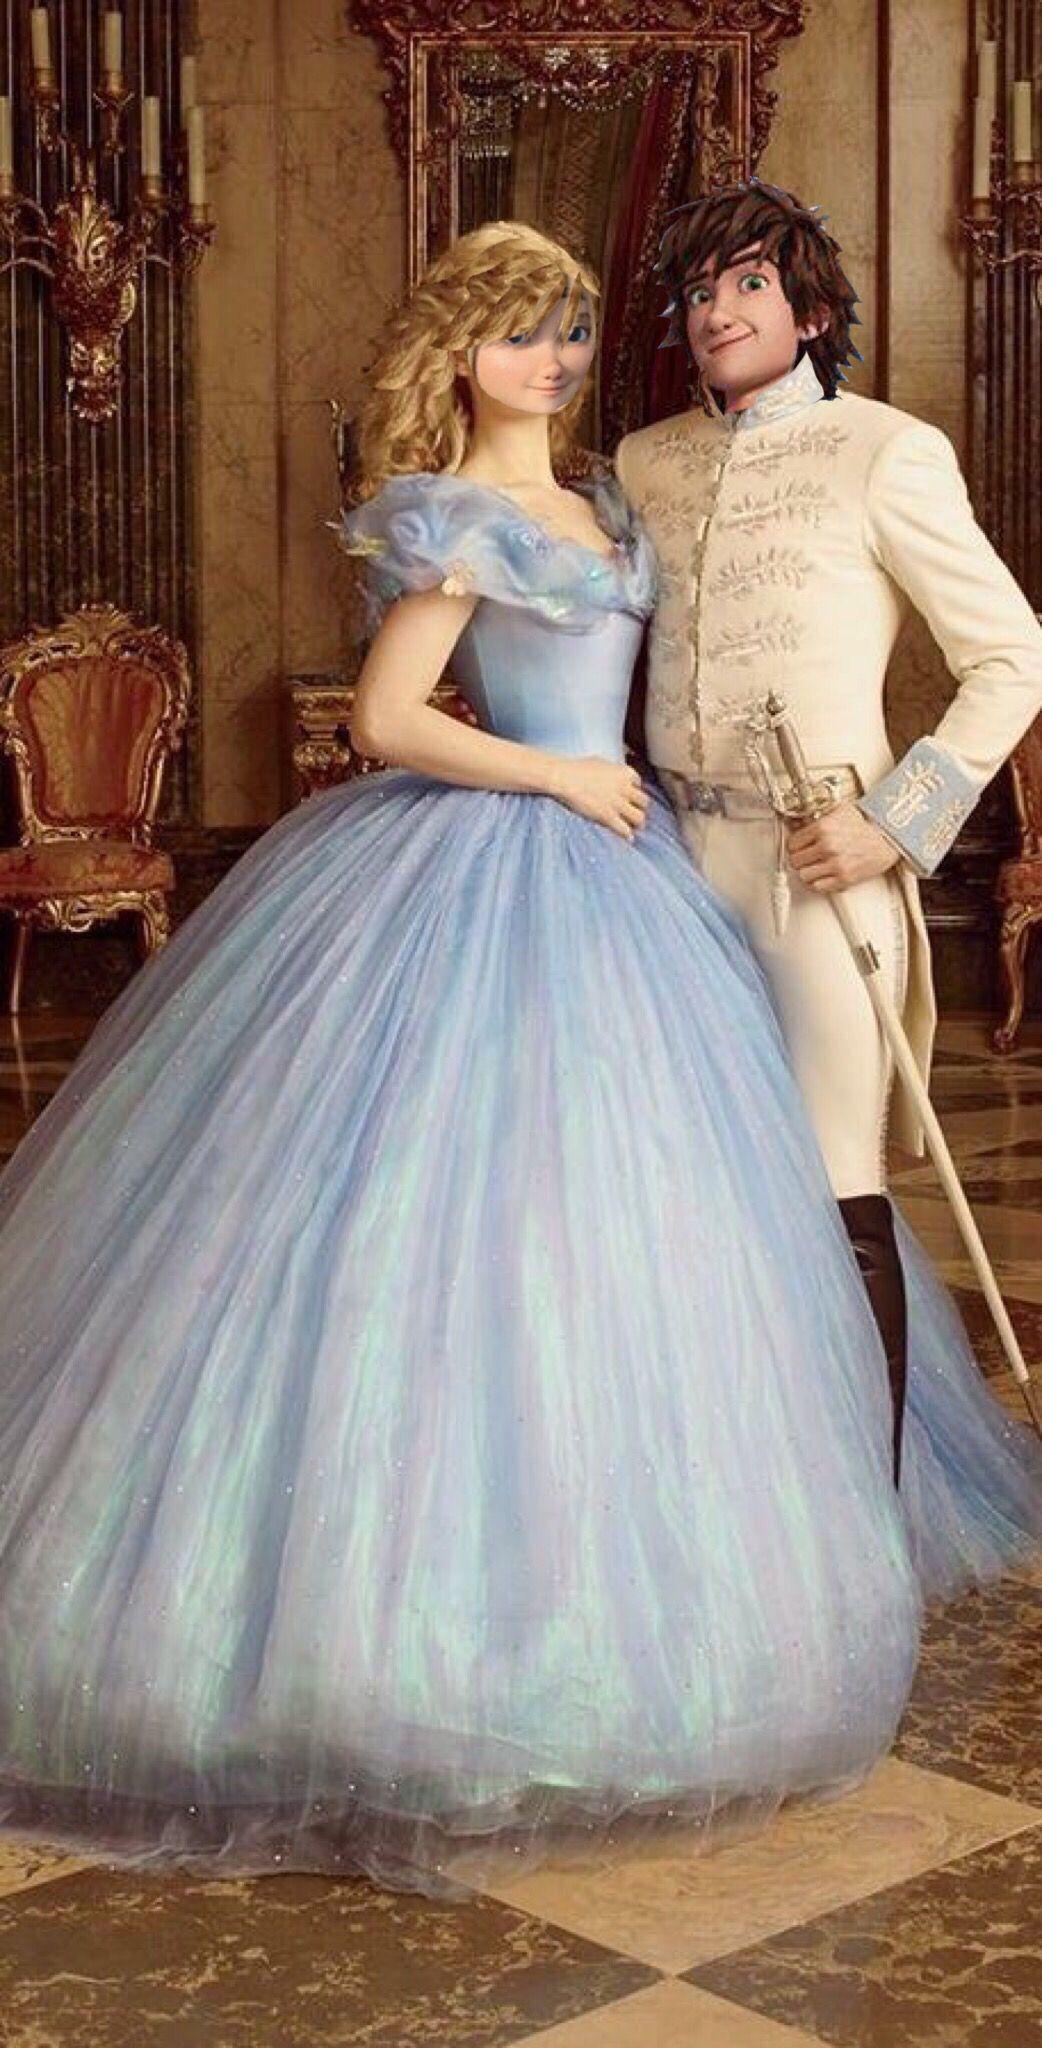 173ae9fad60 This is hilarious Cinderella 2014